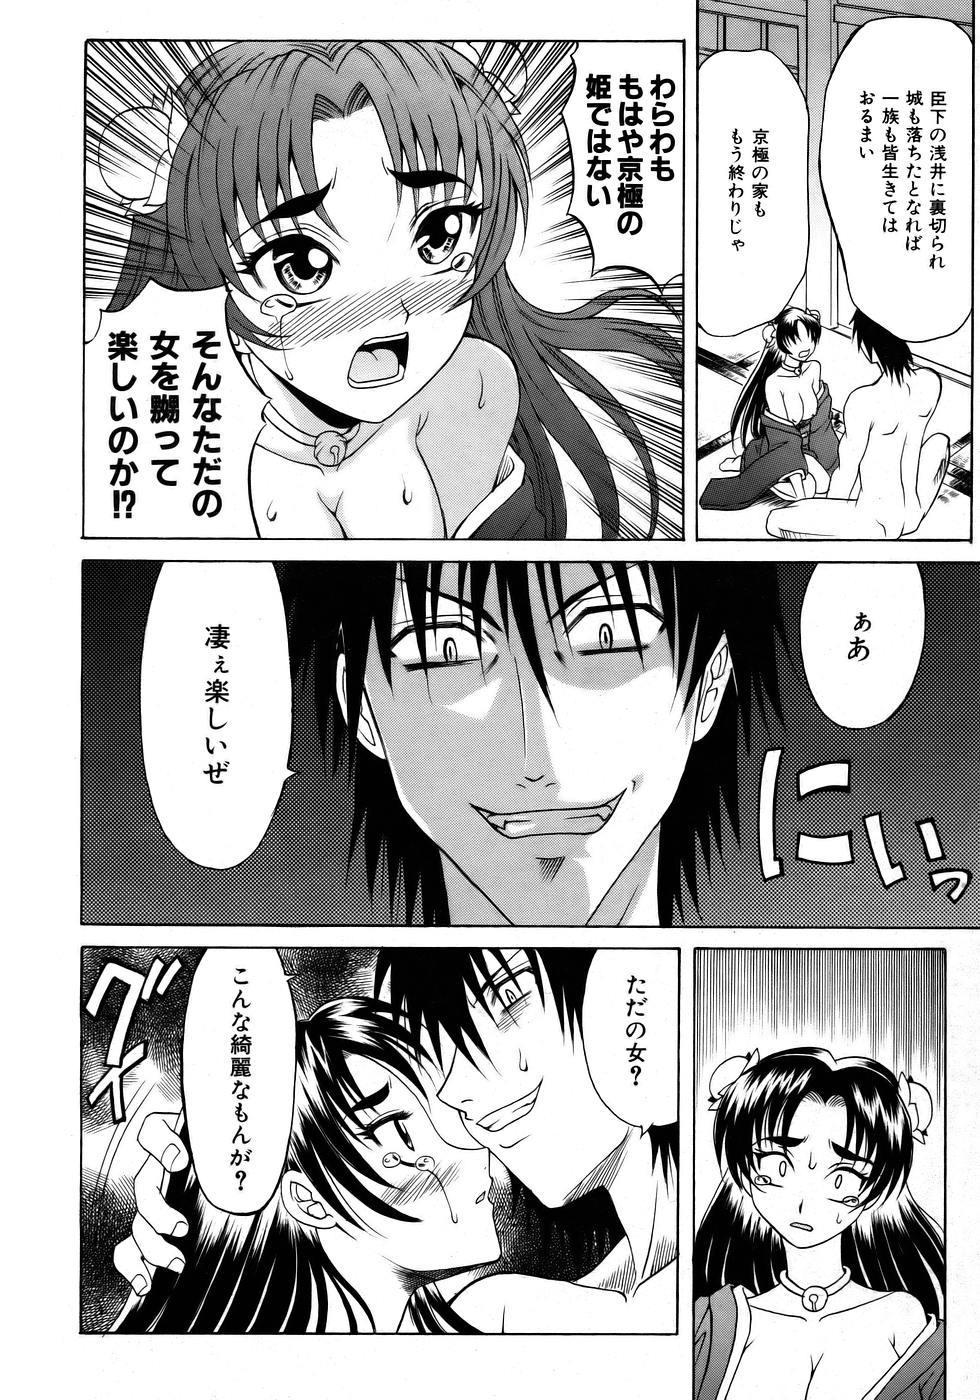 COMIC AUN 2005-12 Vol. 115 15